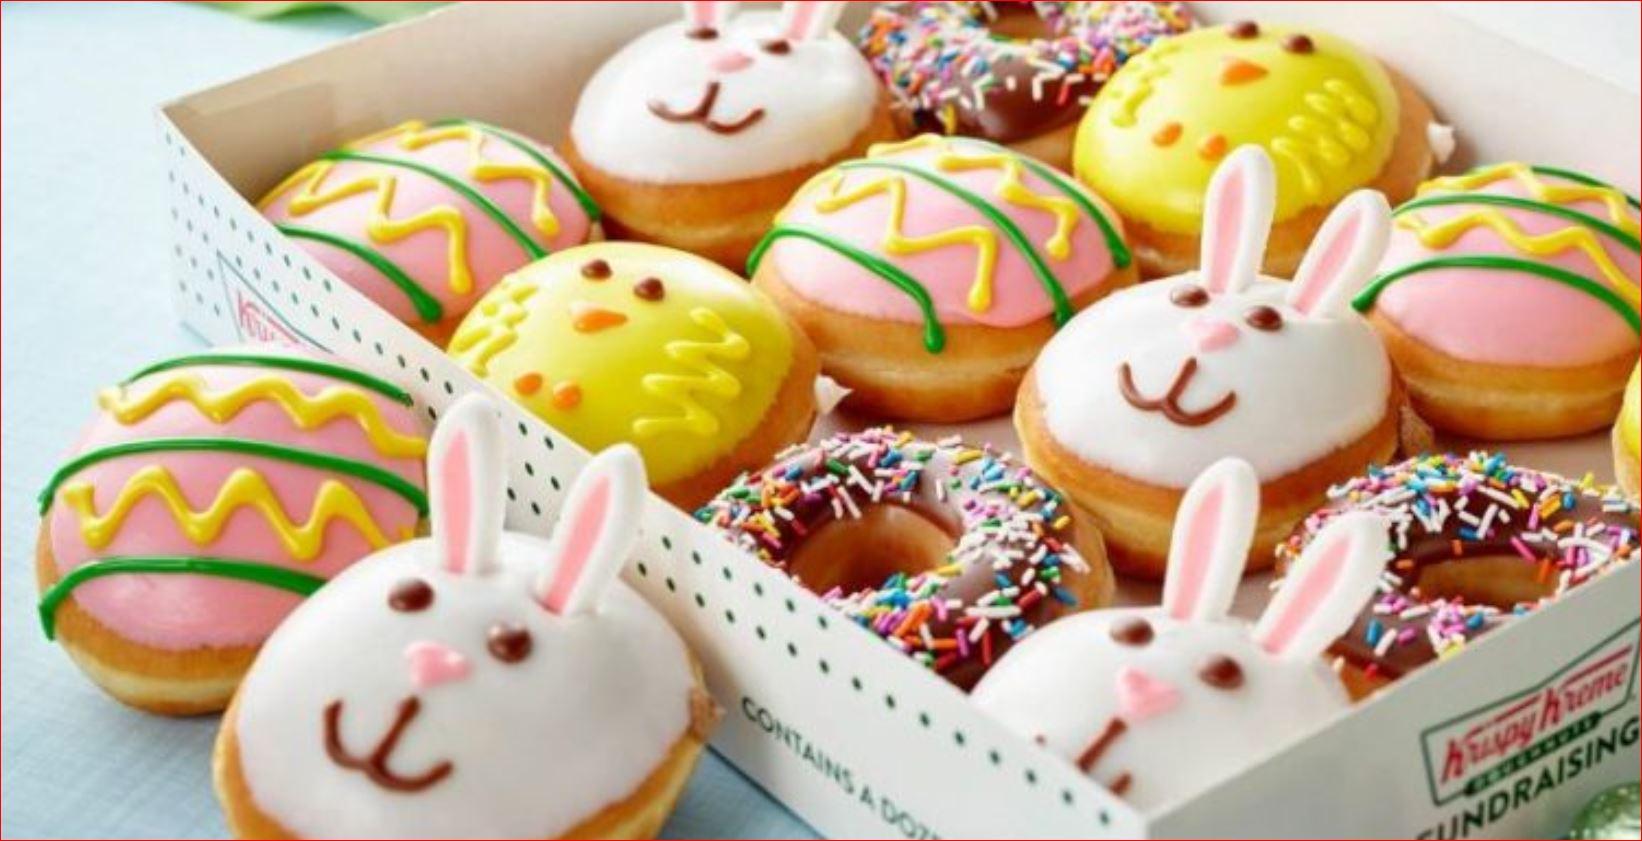 Krispy Kreme Guest Feedback Survey